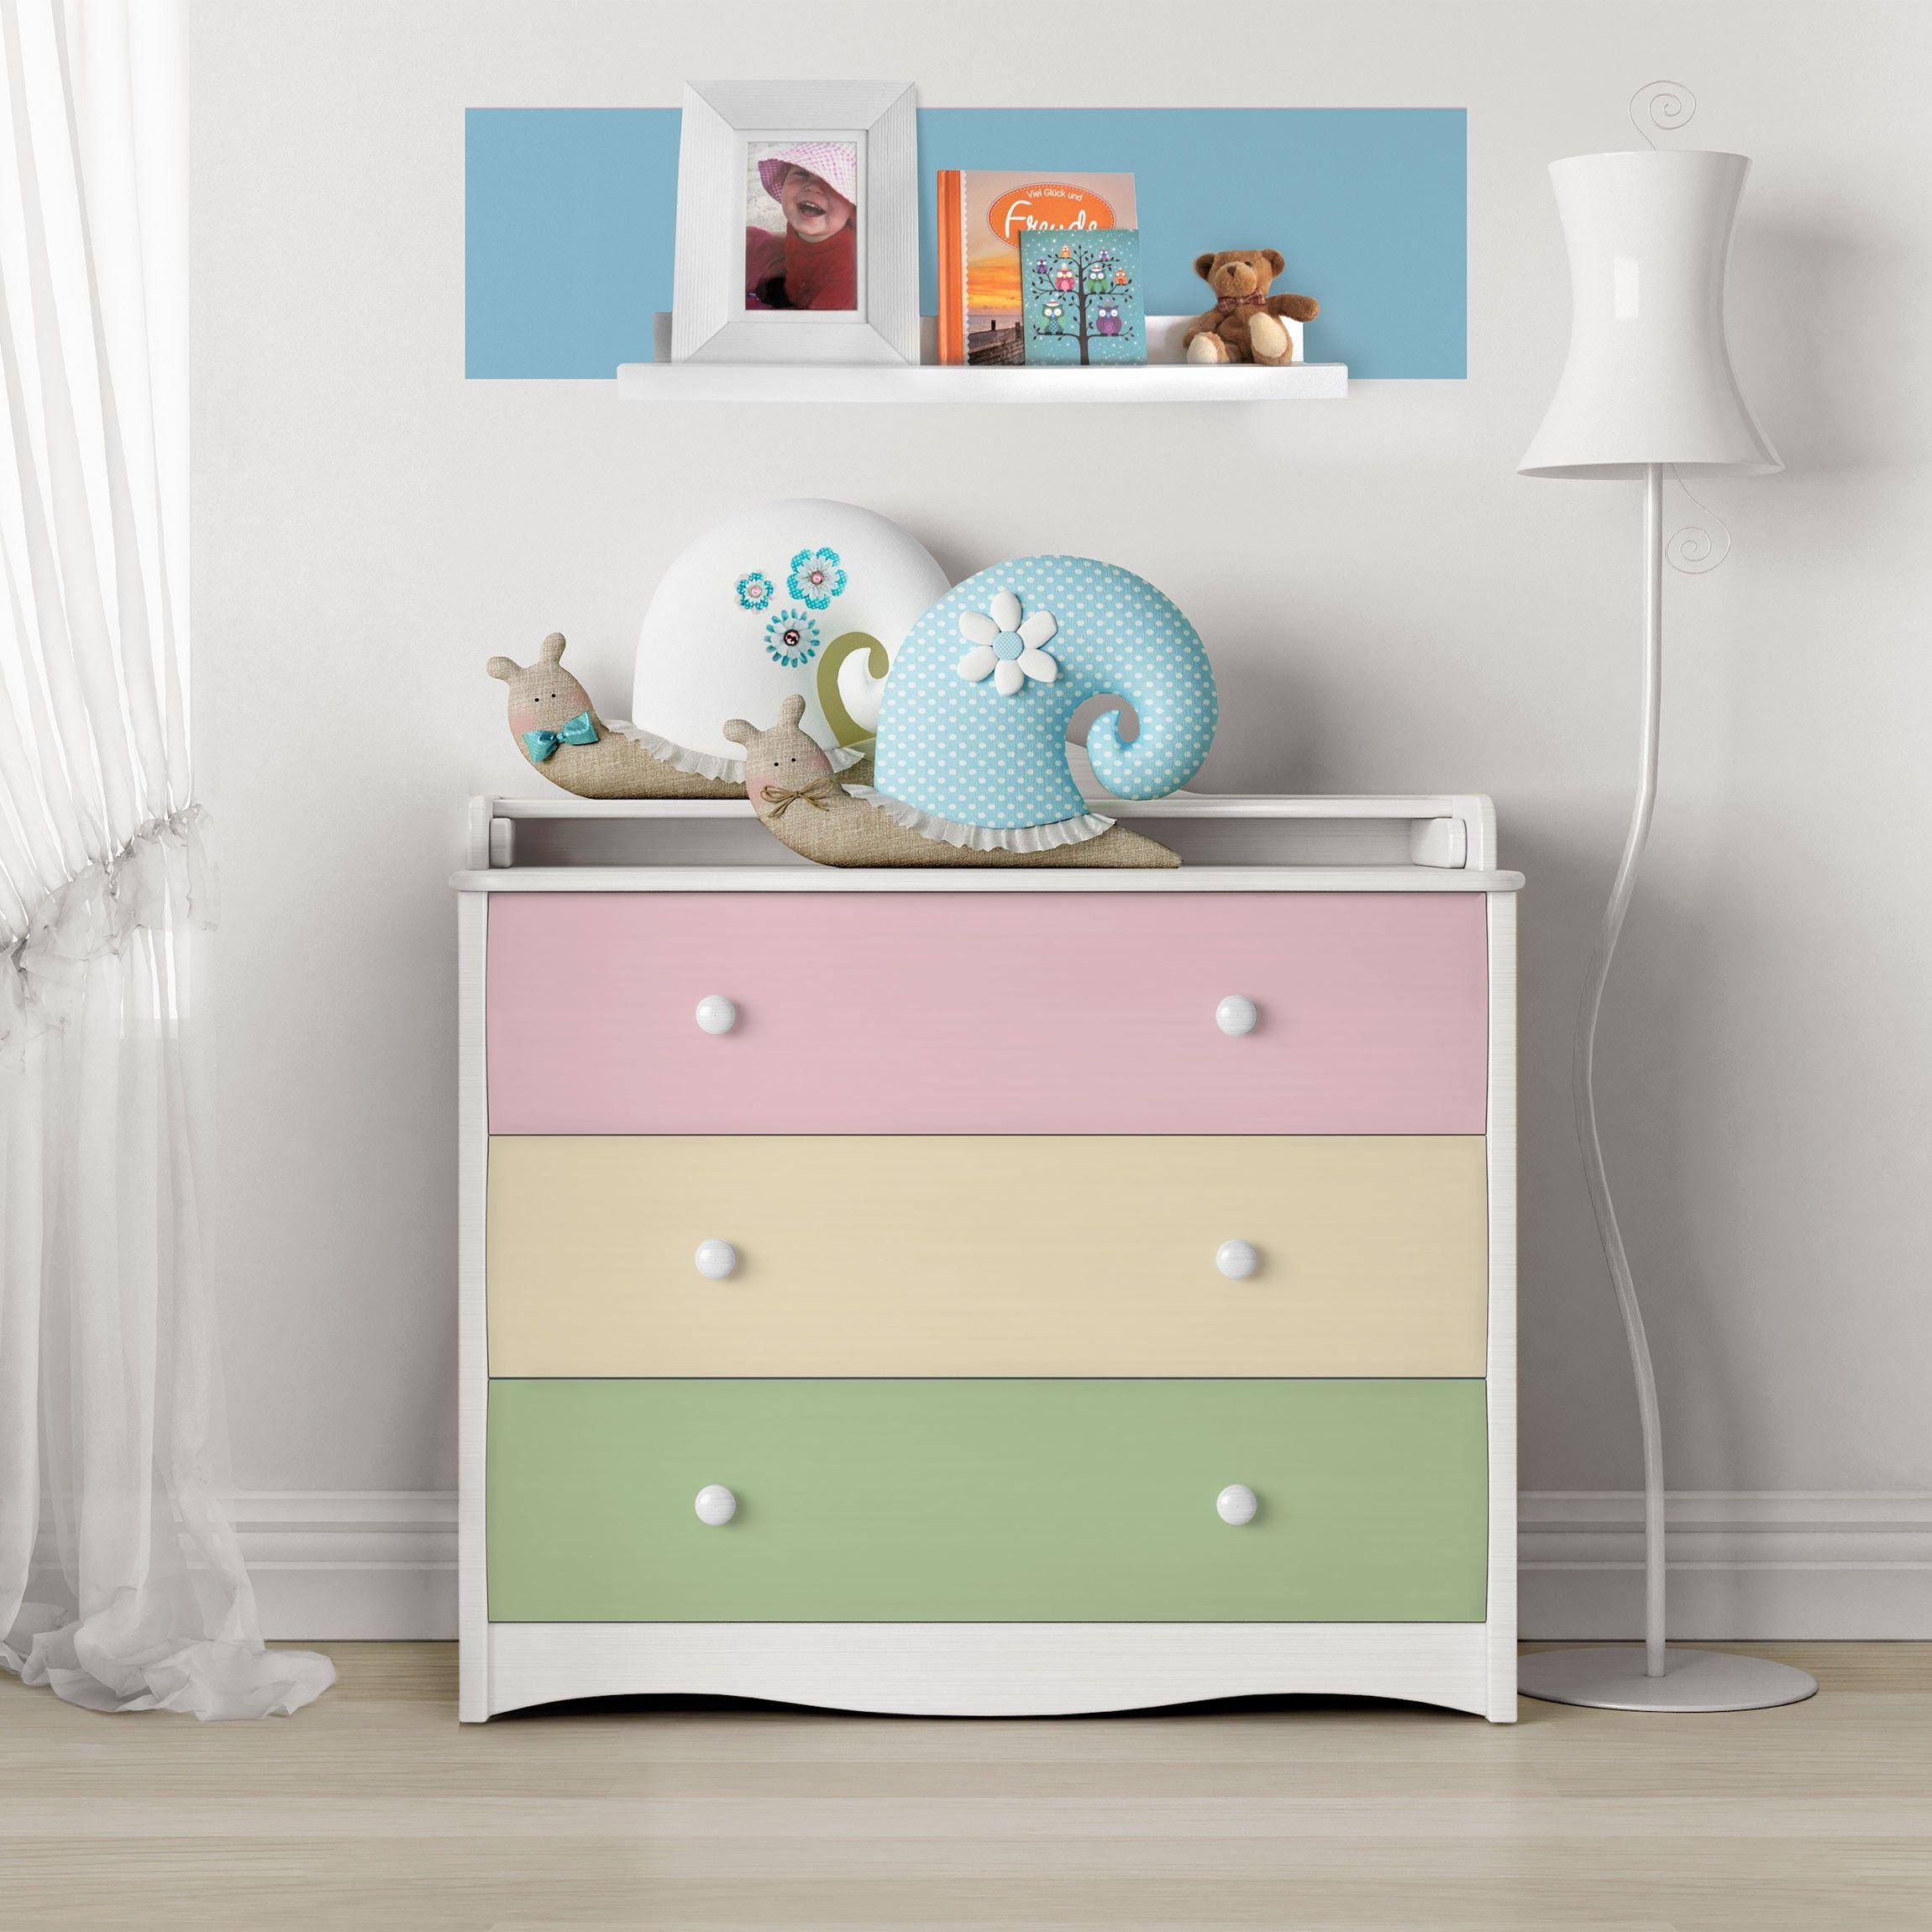 Carta Adesiva Per Rivestire Mobili.Carta Adesiva Per Mobili Set Of 4 Beautiful Pastel Colors